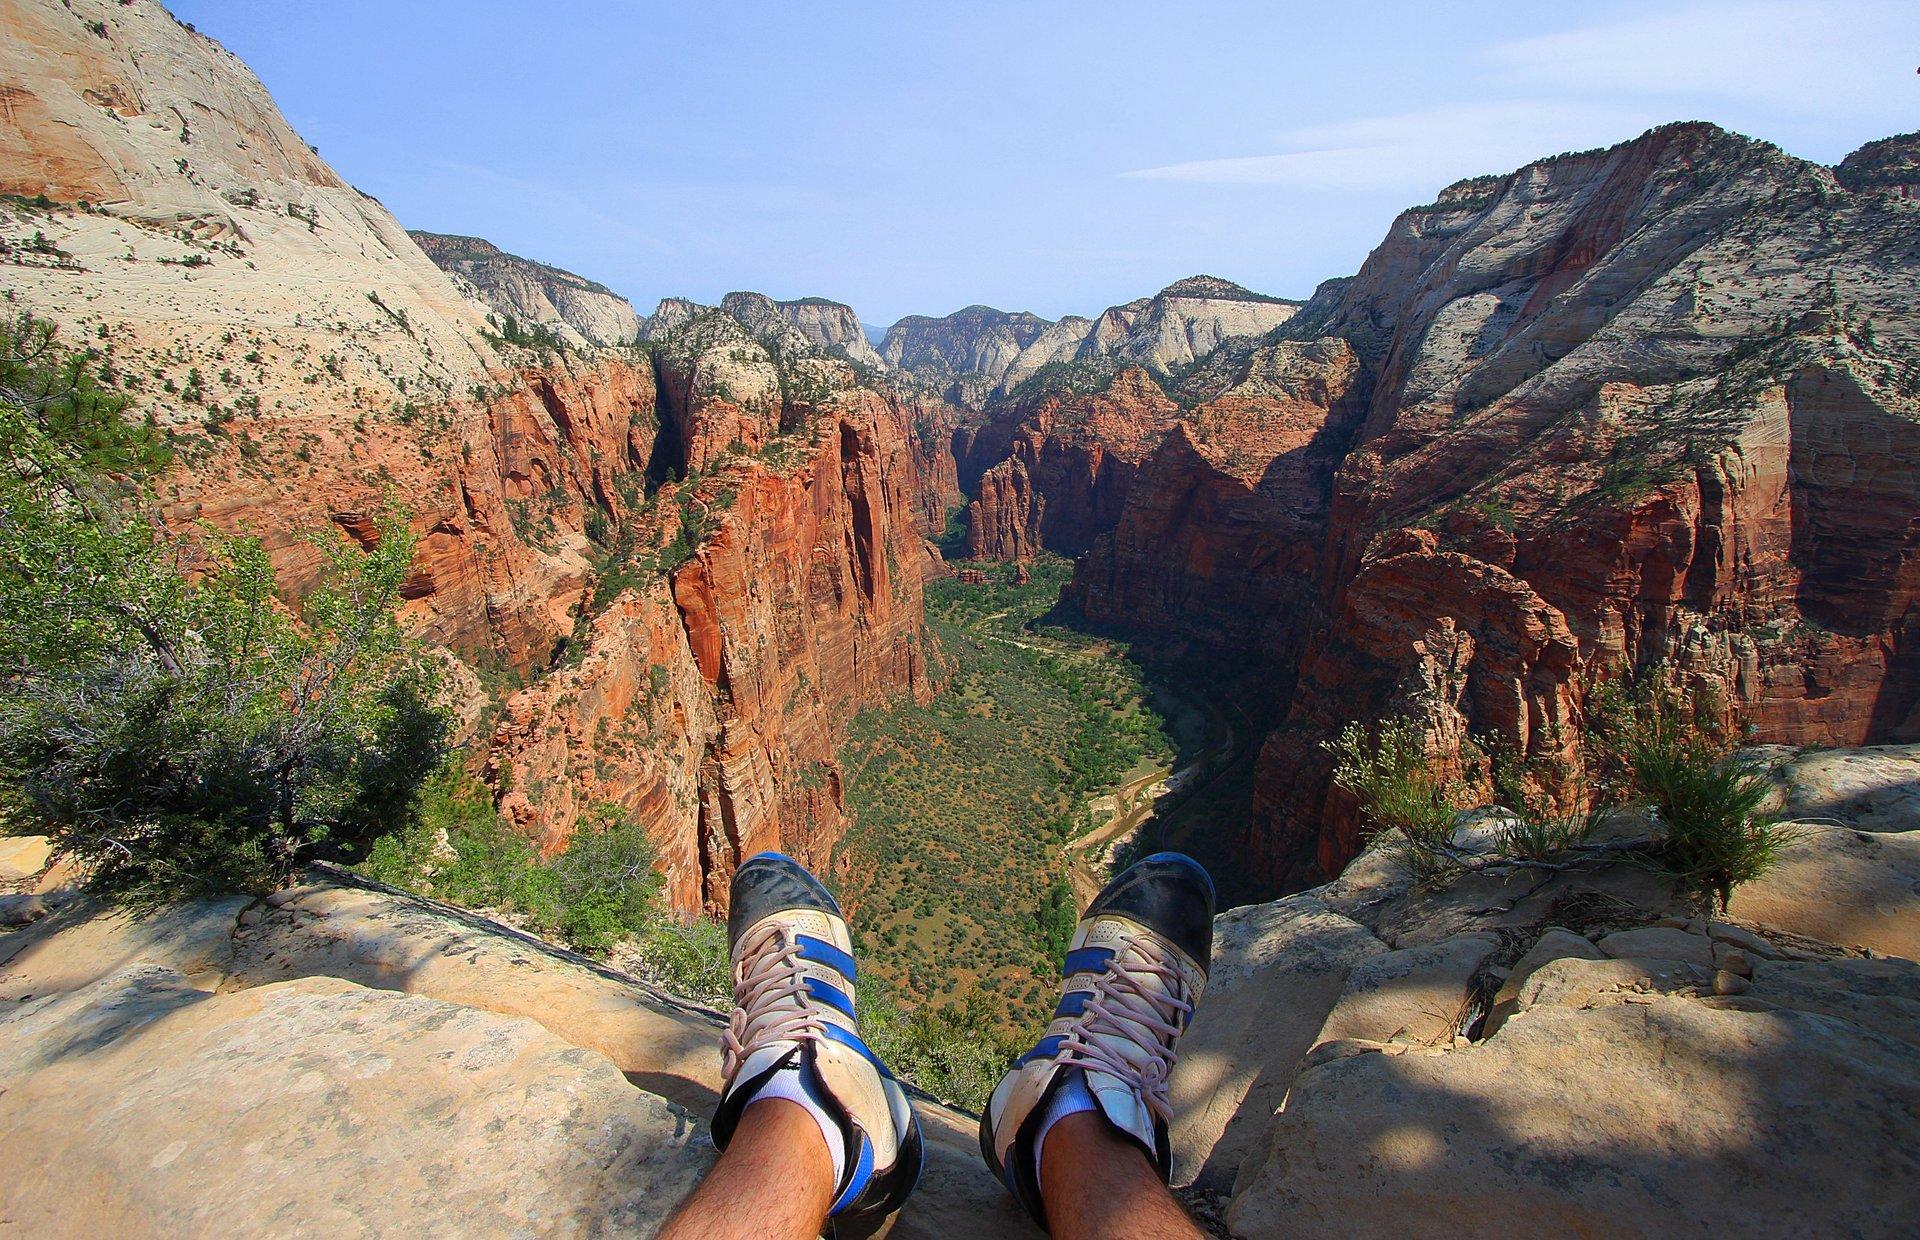 Zion Rock Climbing in Utah 2020 - Best Time